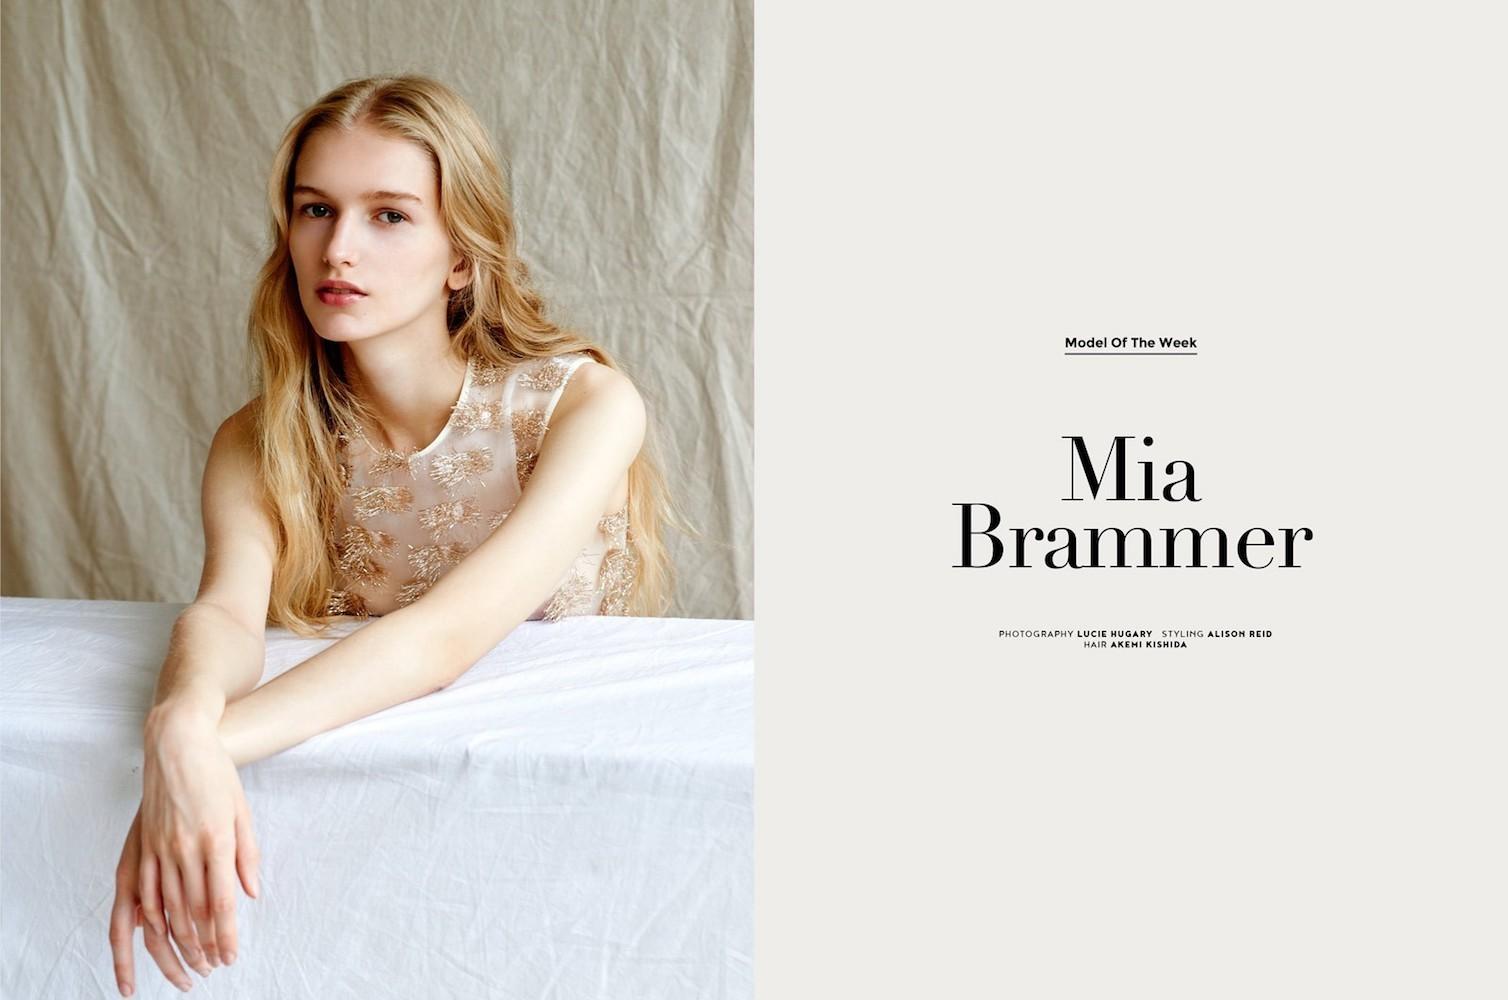 Mia Brammer